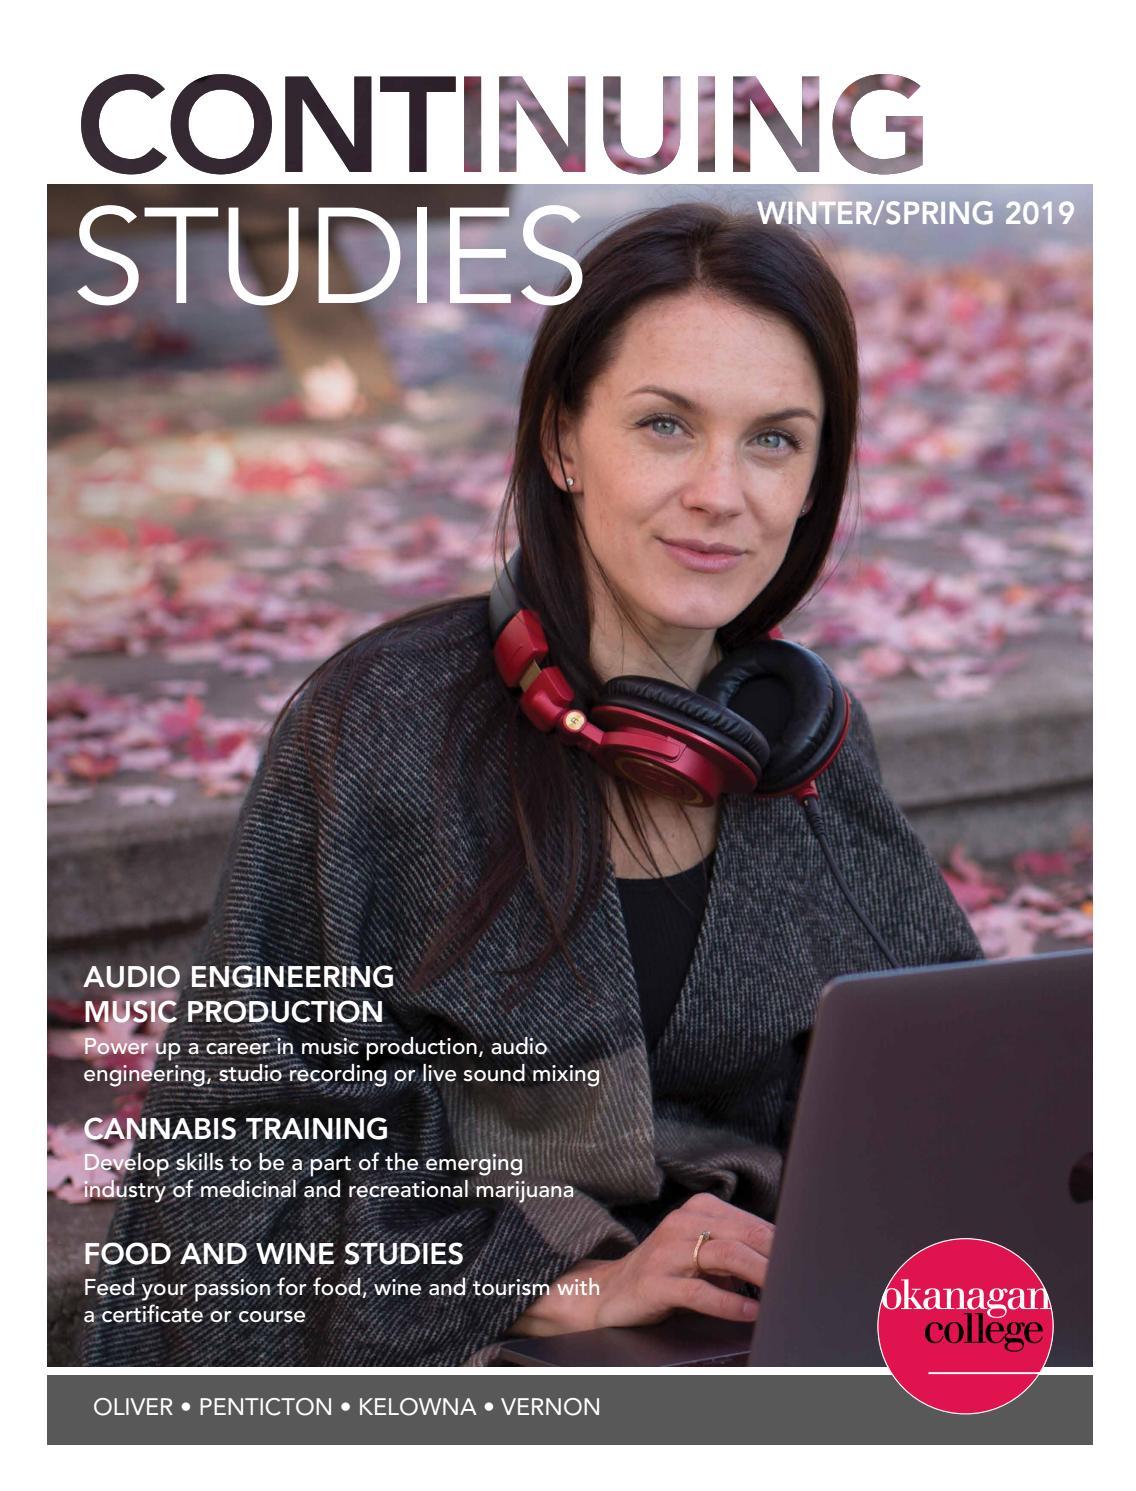 Okanagan College Continuing Studies Winter/Spring 2019